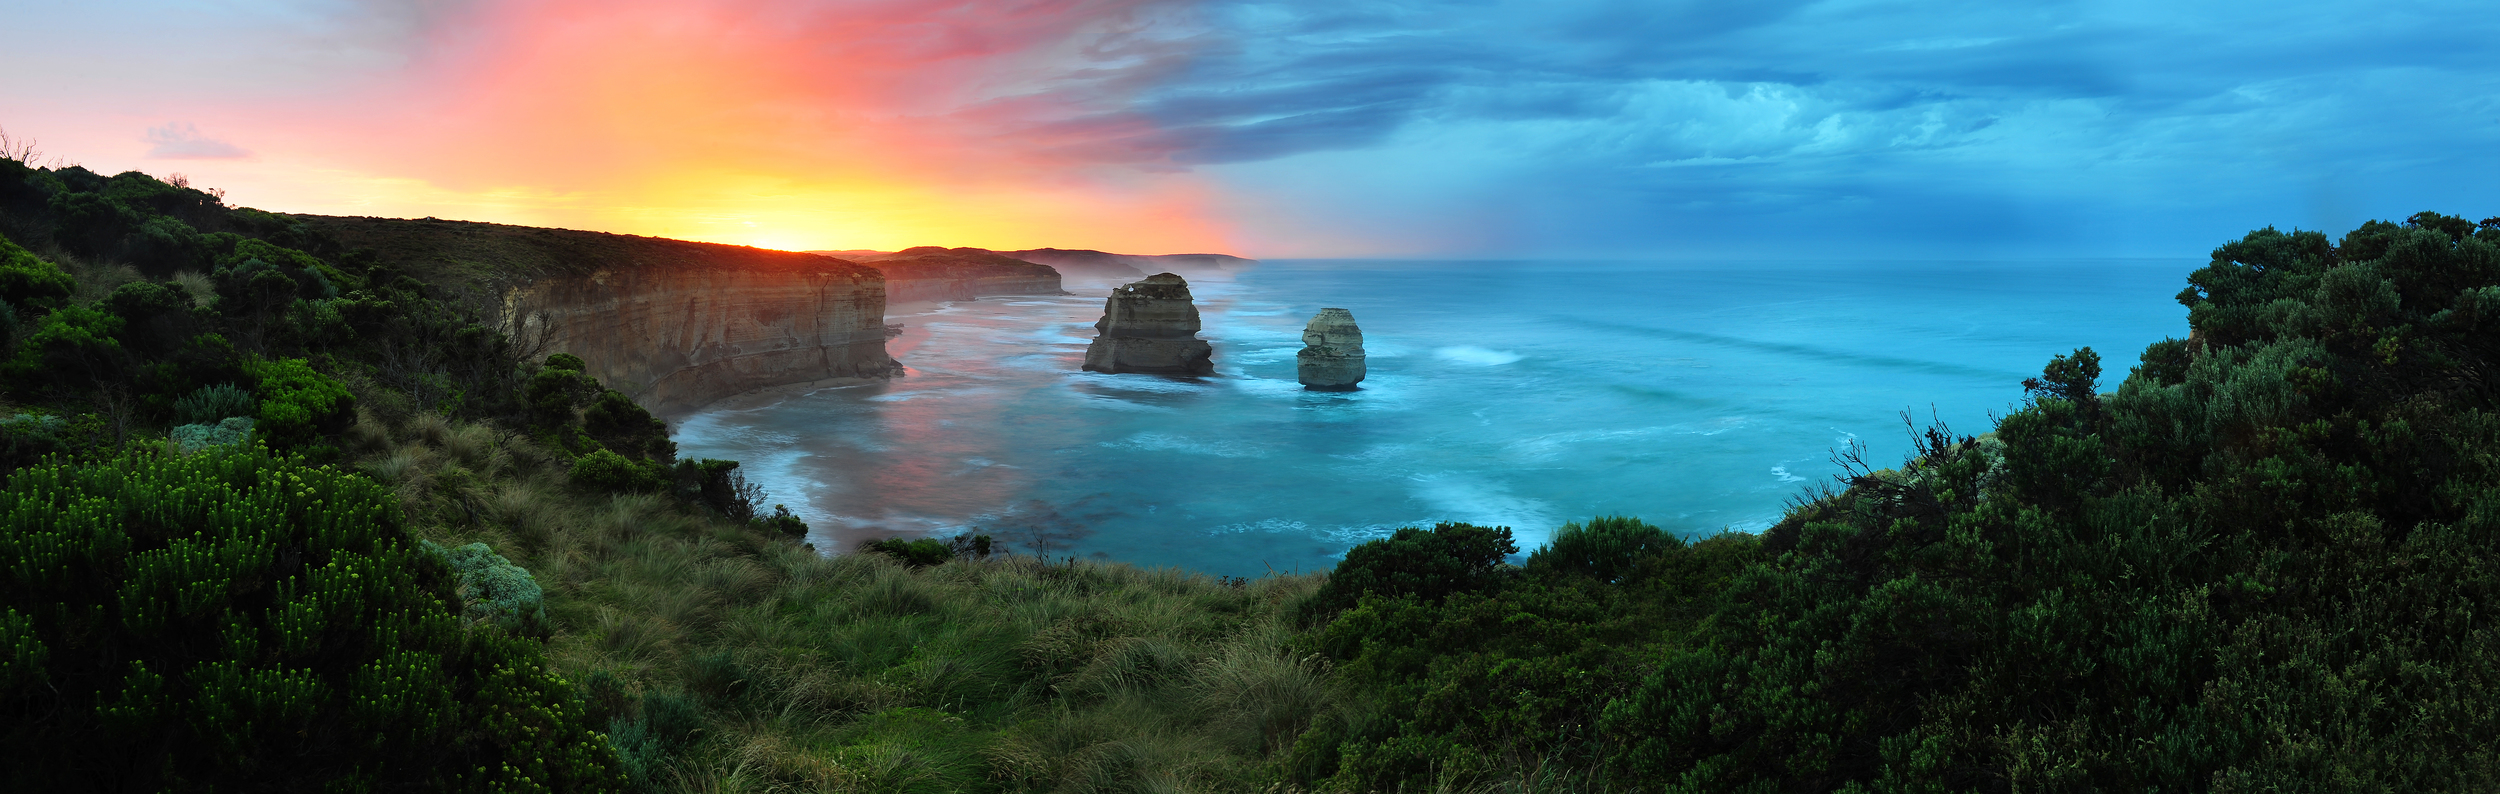 12 APOSTEL - AUSTRALIEN